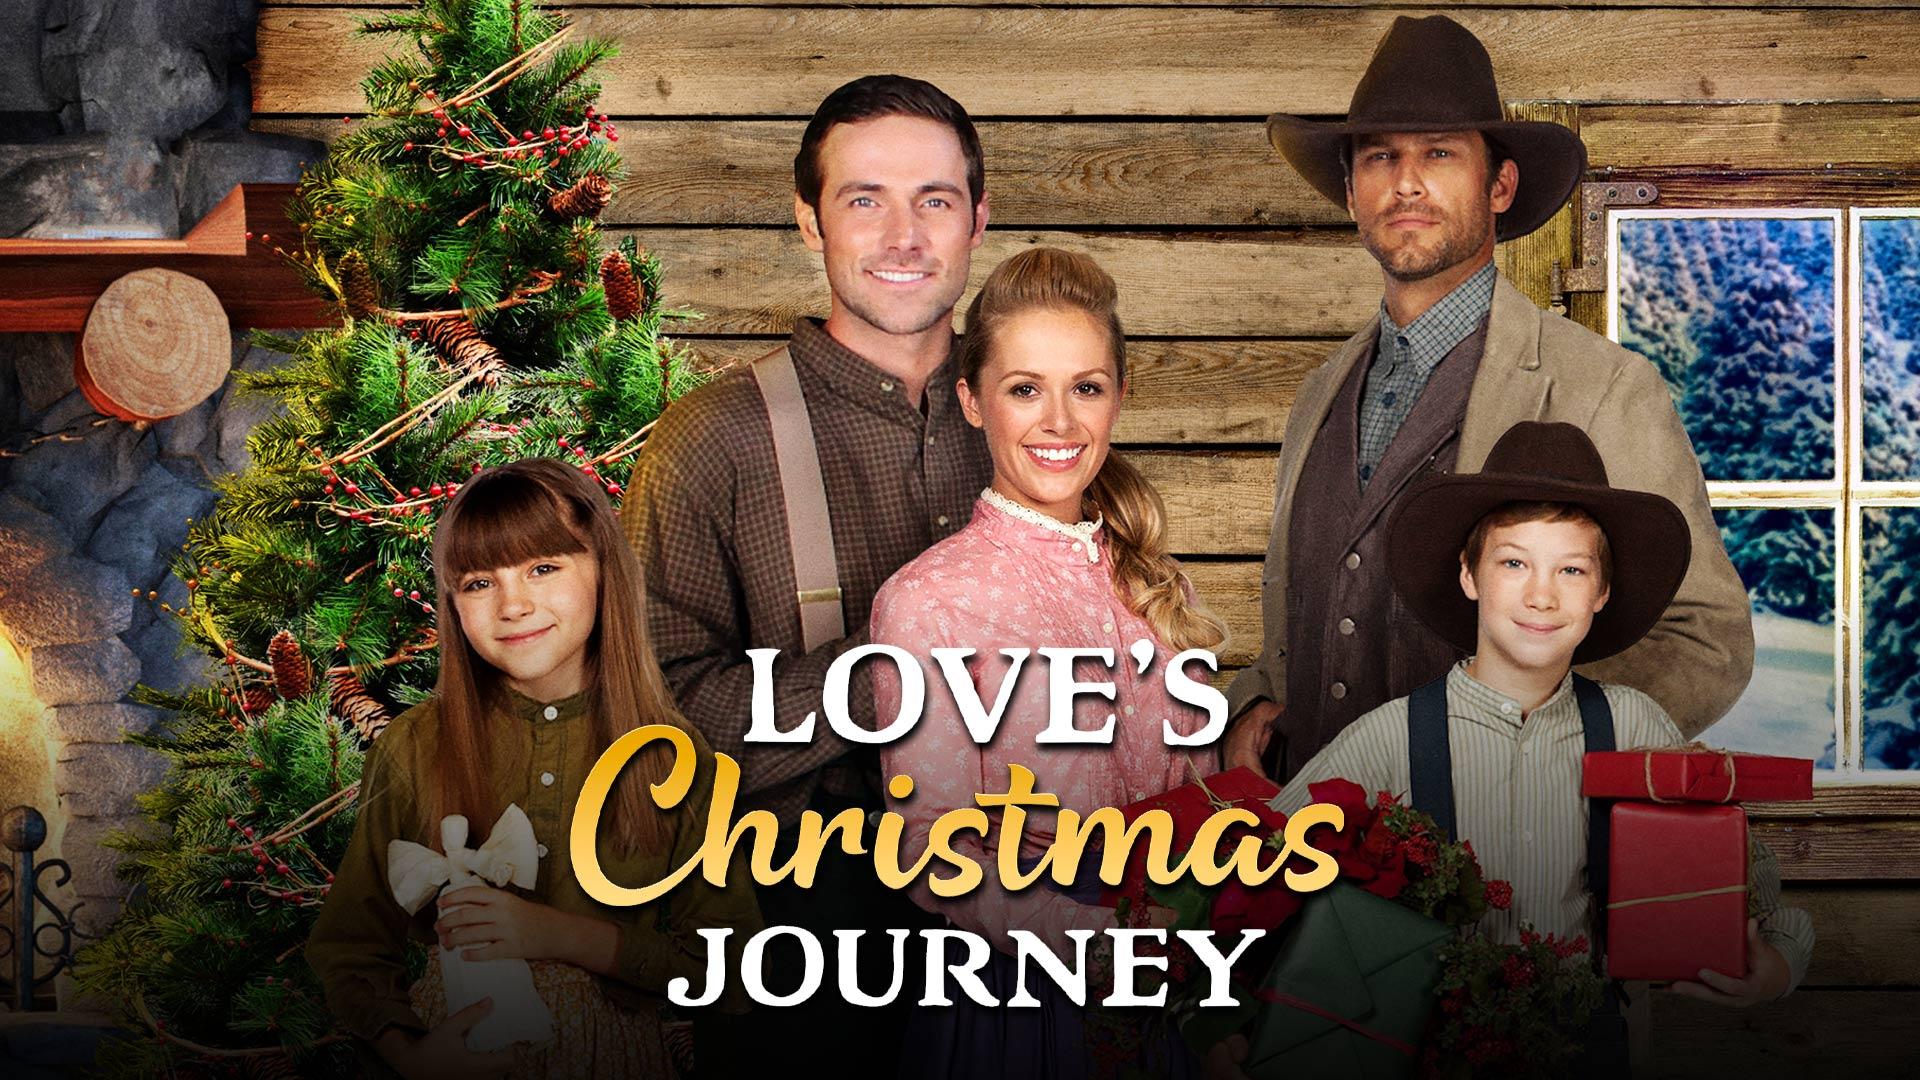 Love's_Christmas_Journey - Season 1